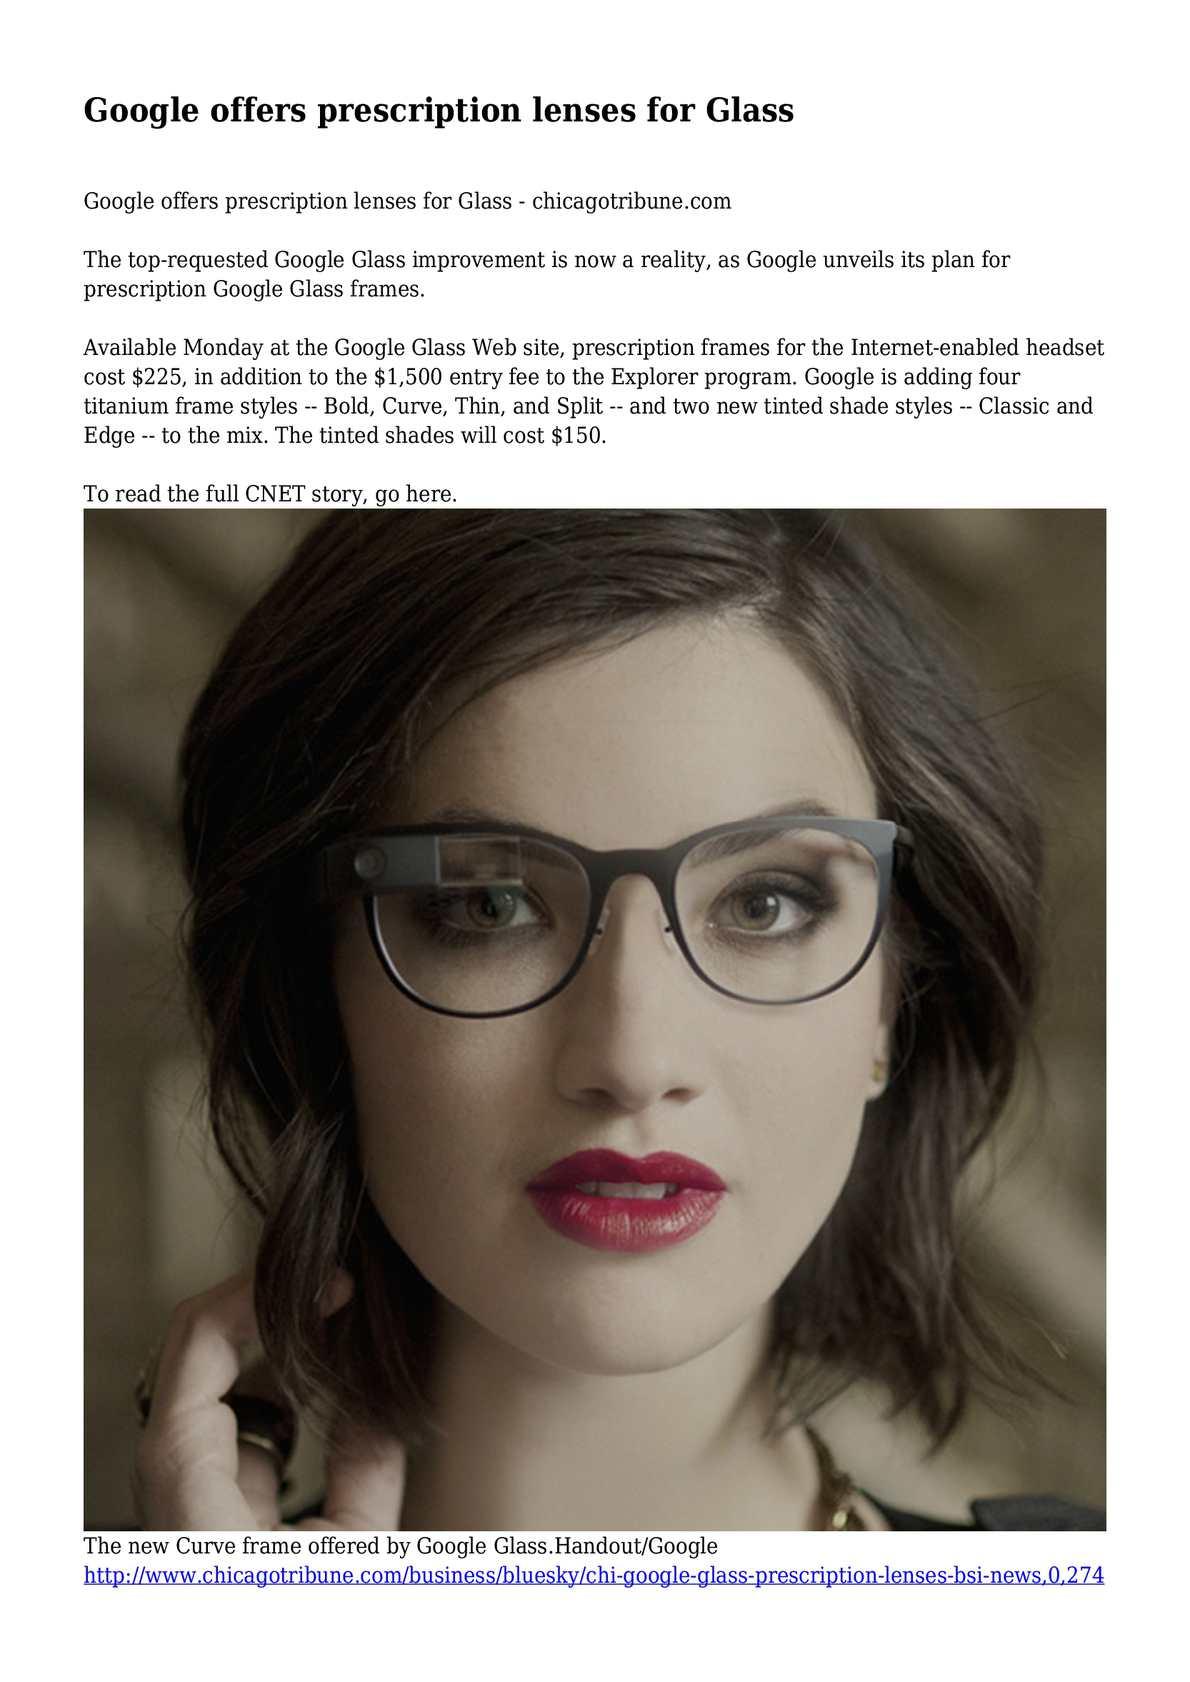 153702aebfb1 Calaméo - Google offers prescription lenses for Glass